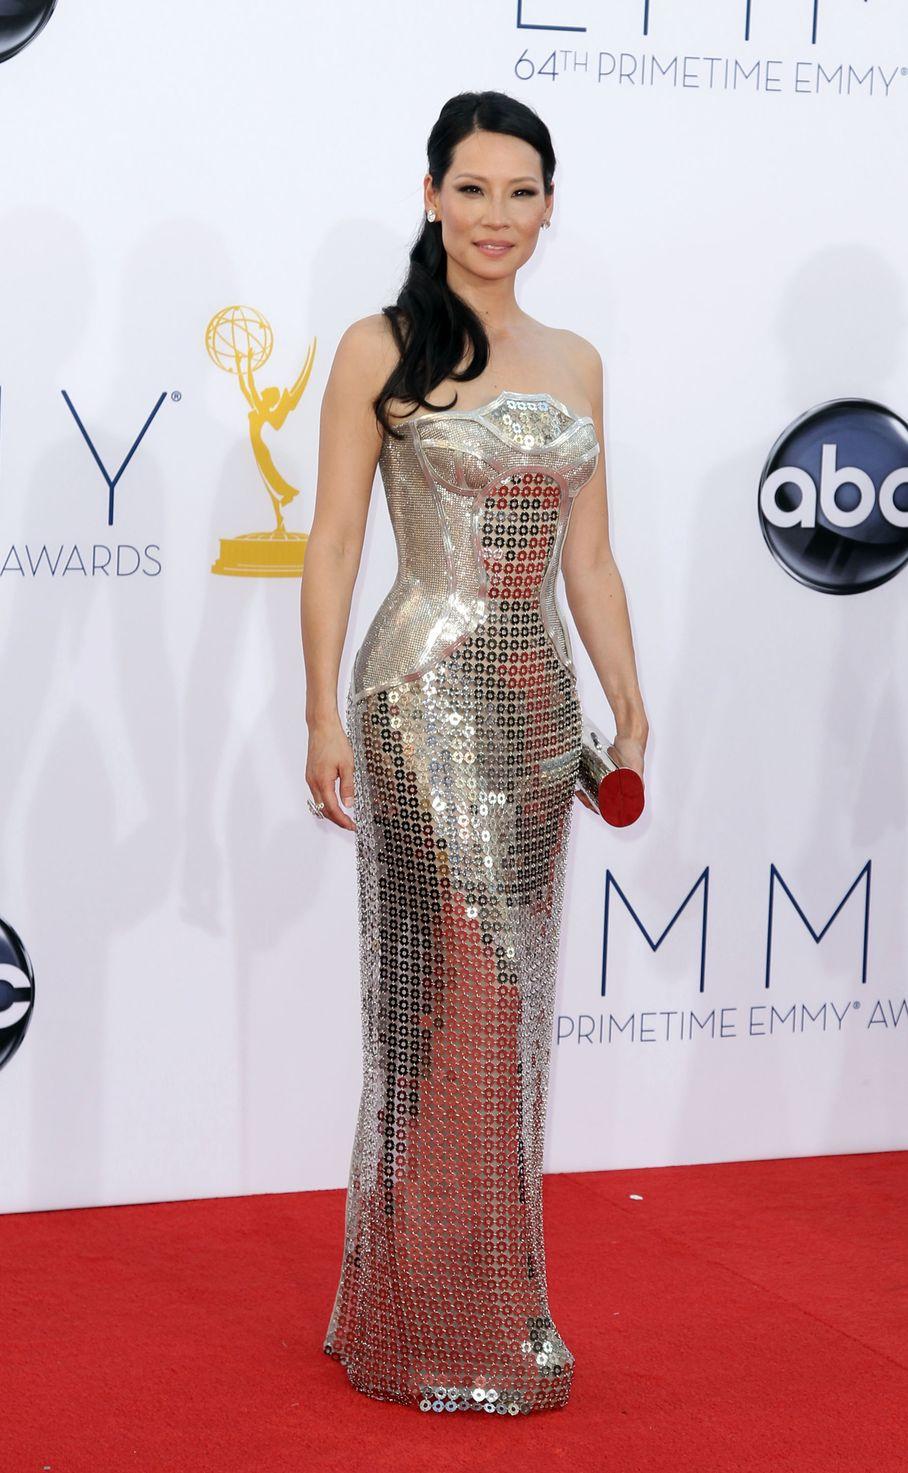 Lucy Liu - 2012 Emmy Awards, Red Carpet Looks